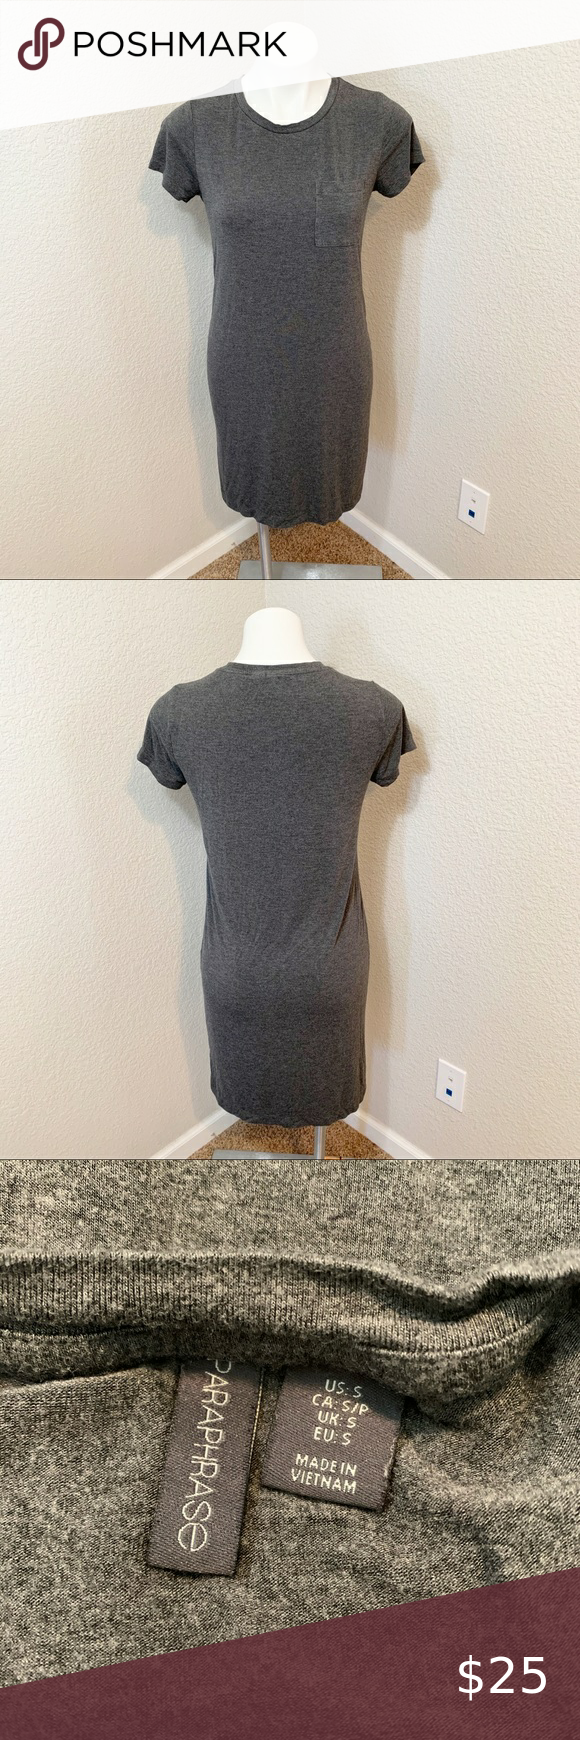 3 25 Paraphrase Dark Gray T Shirt Style Dres Tshirt Grey Dress